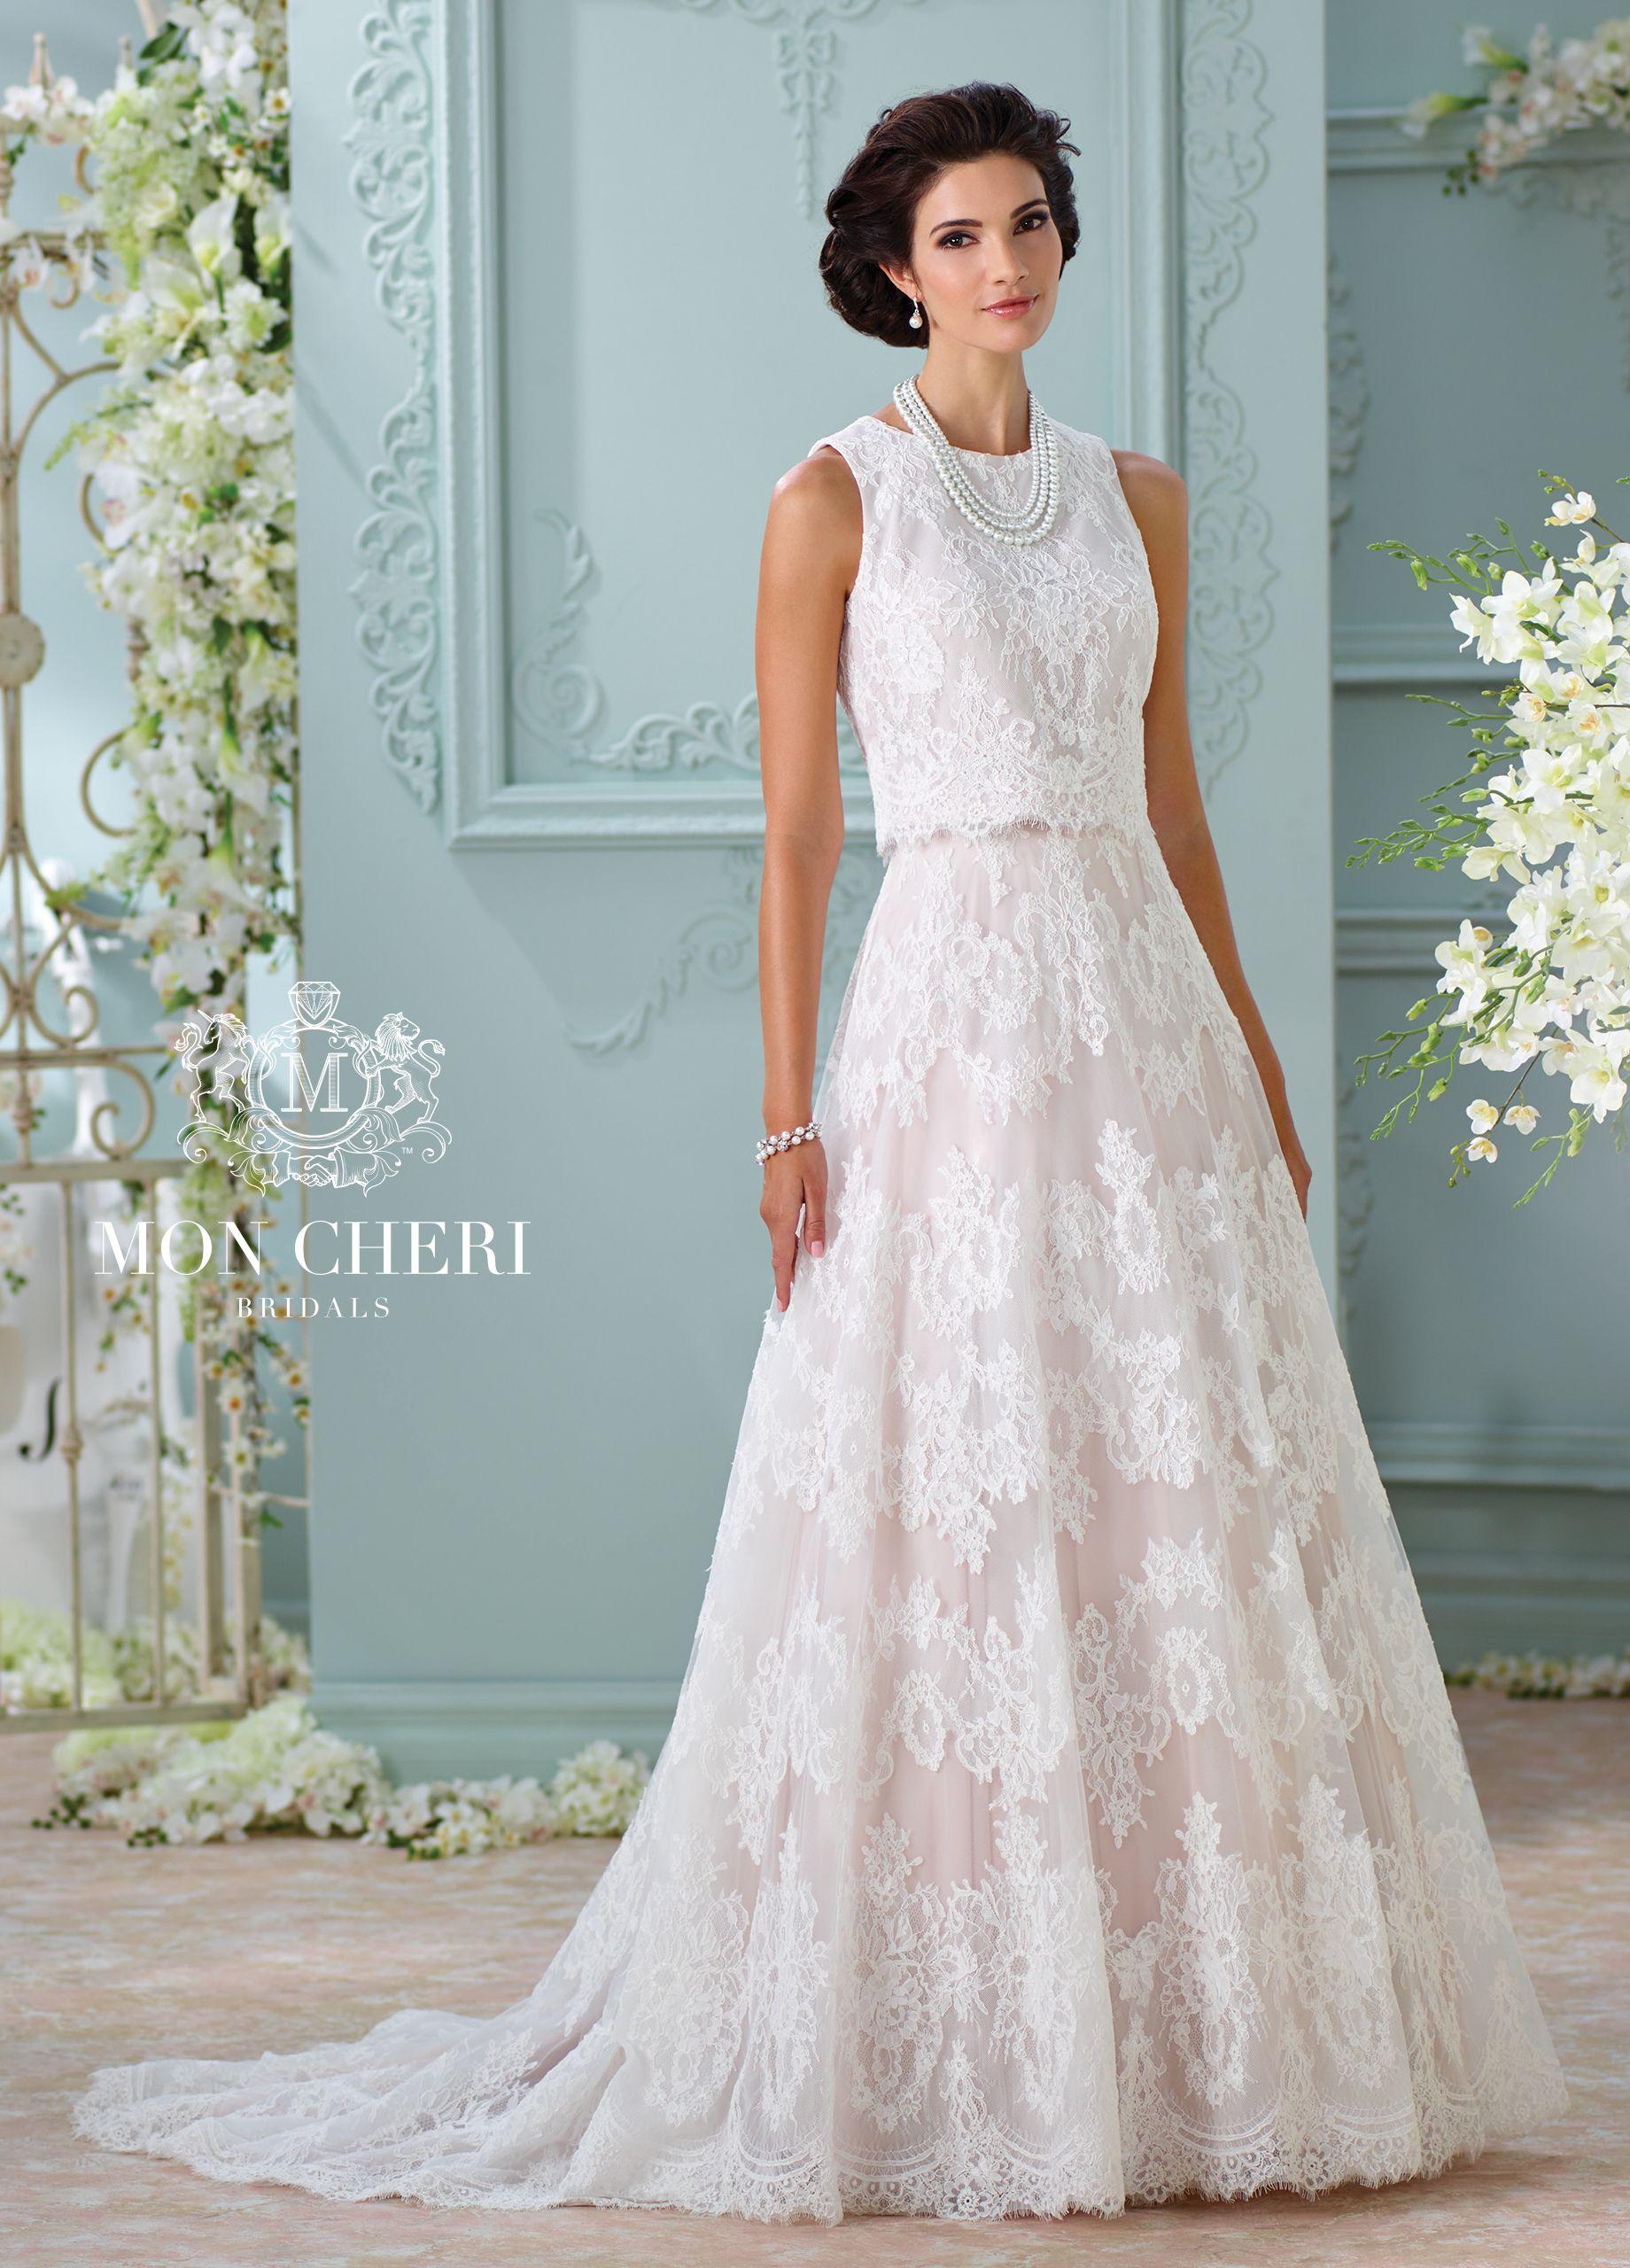 Two-Piece Sleeveless Lace Wedding Dress- 116209 Rhyah ...